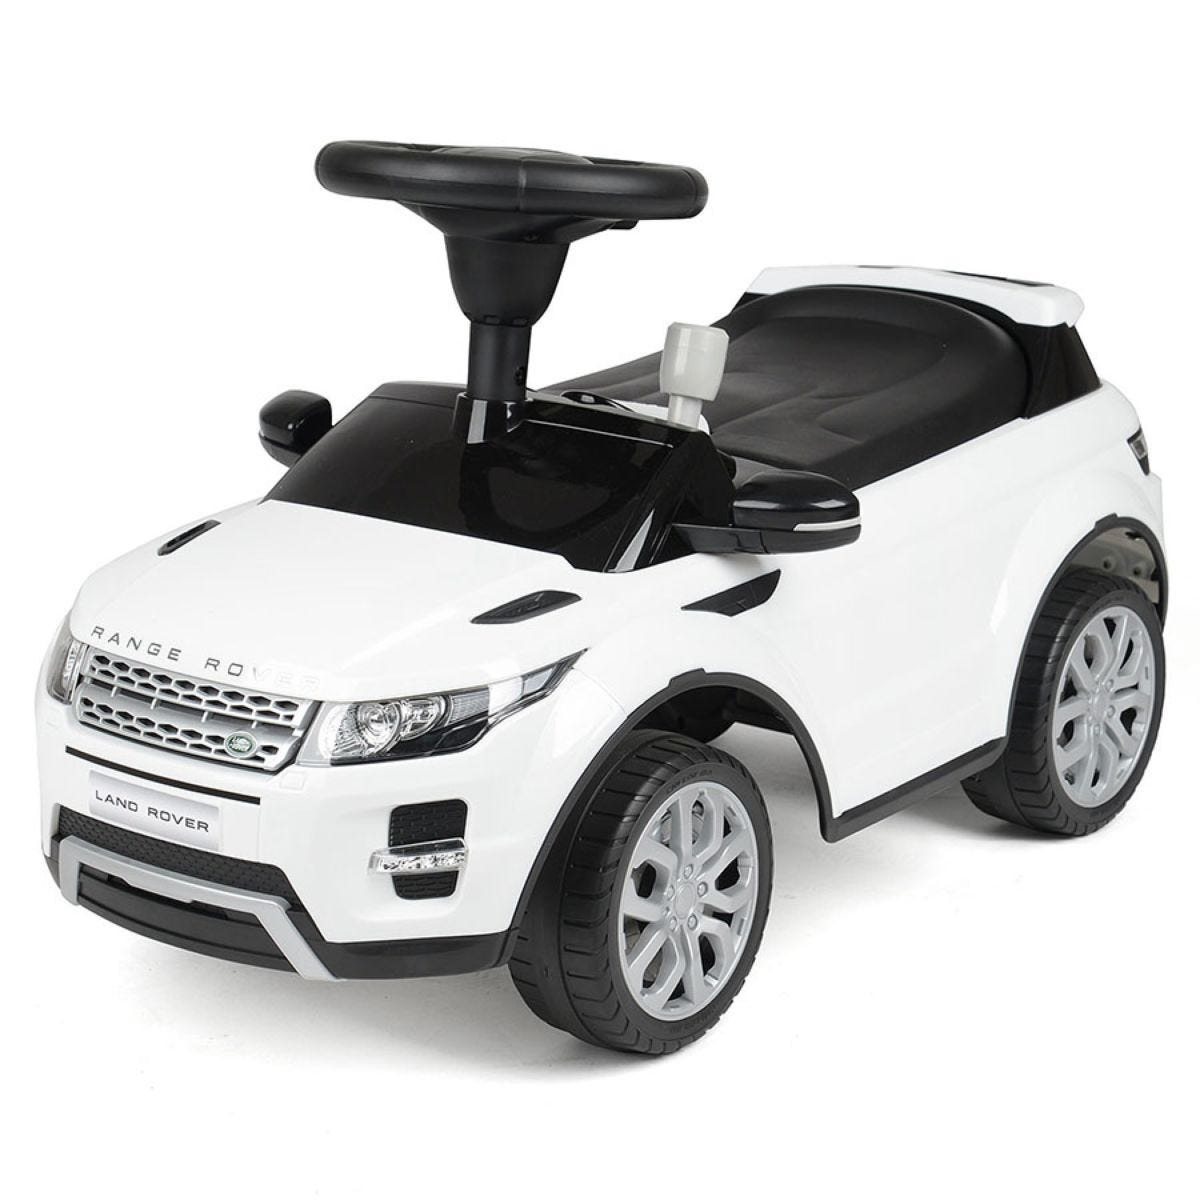 Range Rover Evoque Foot-to-Floor Ride-On